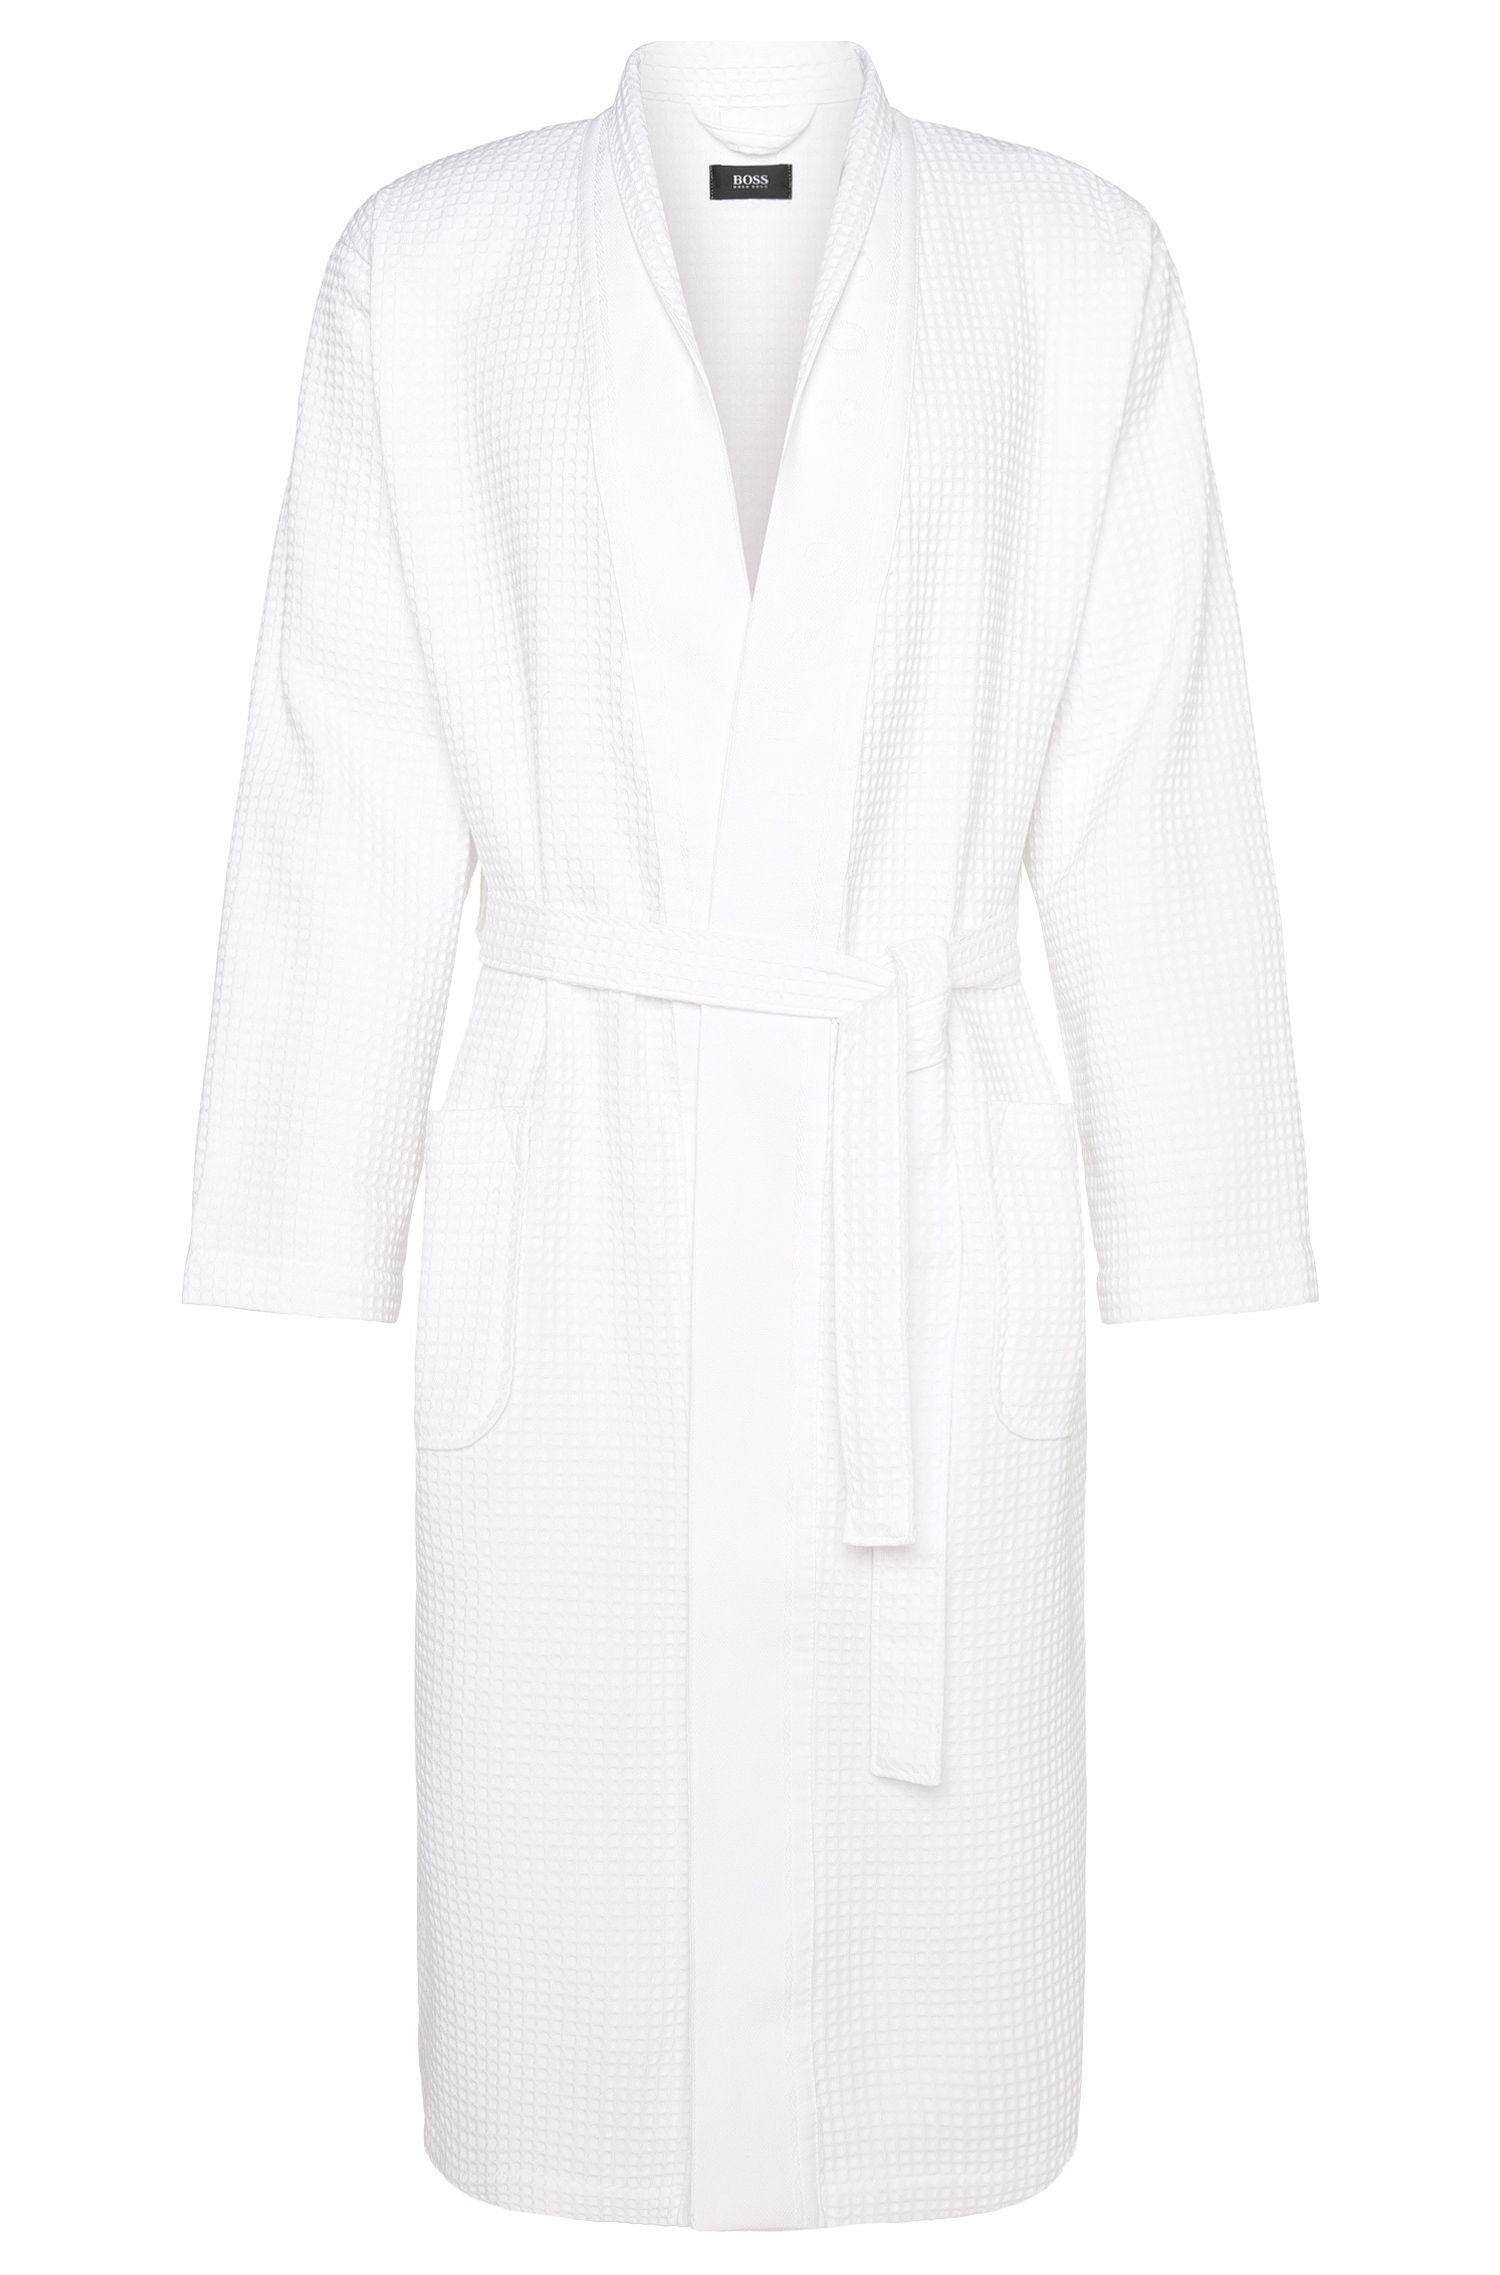 Cotton Bamboo Viscose Kimono Robe | Kimono, White